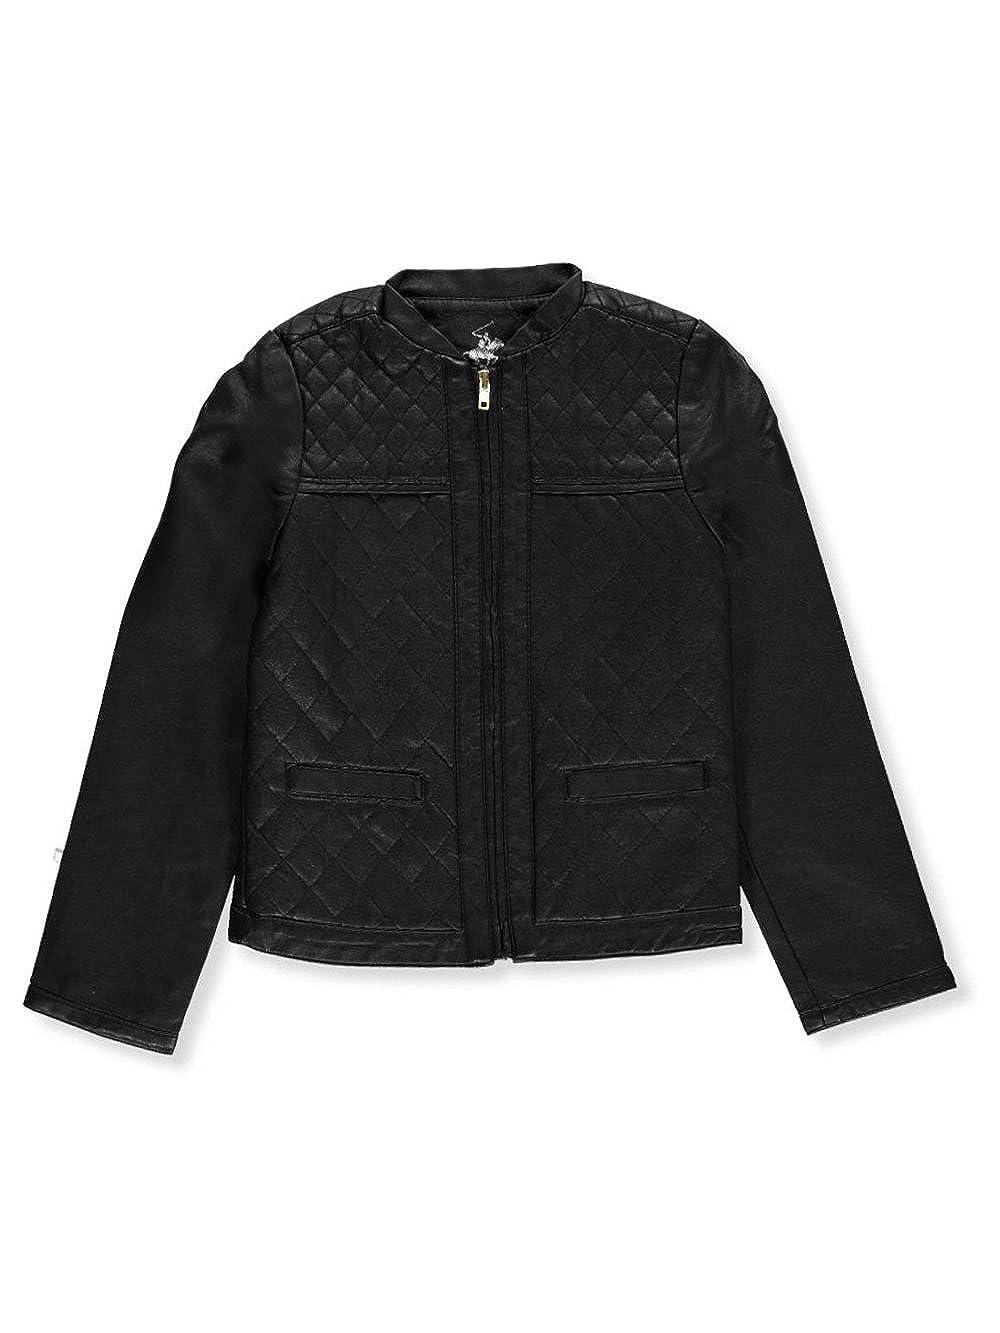 Beverly Hills Polo Club Big Girls Jacket